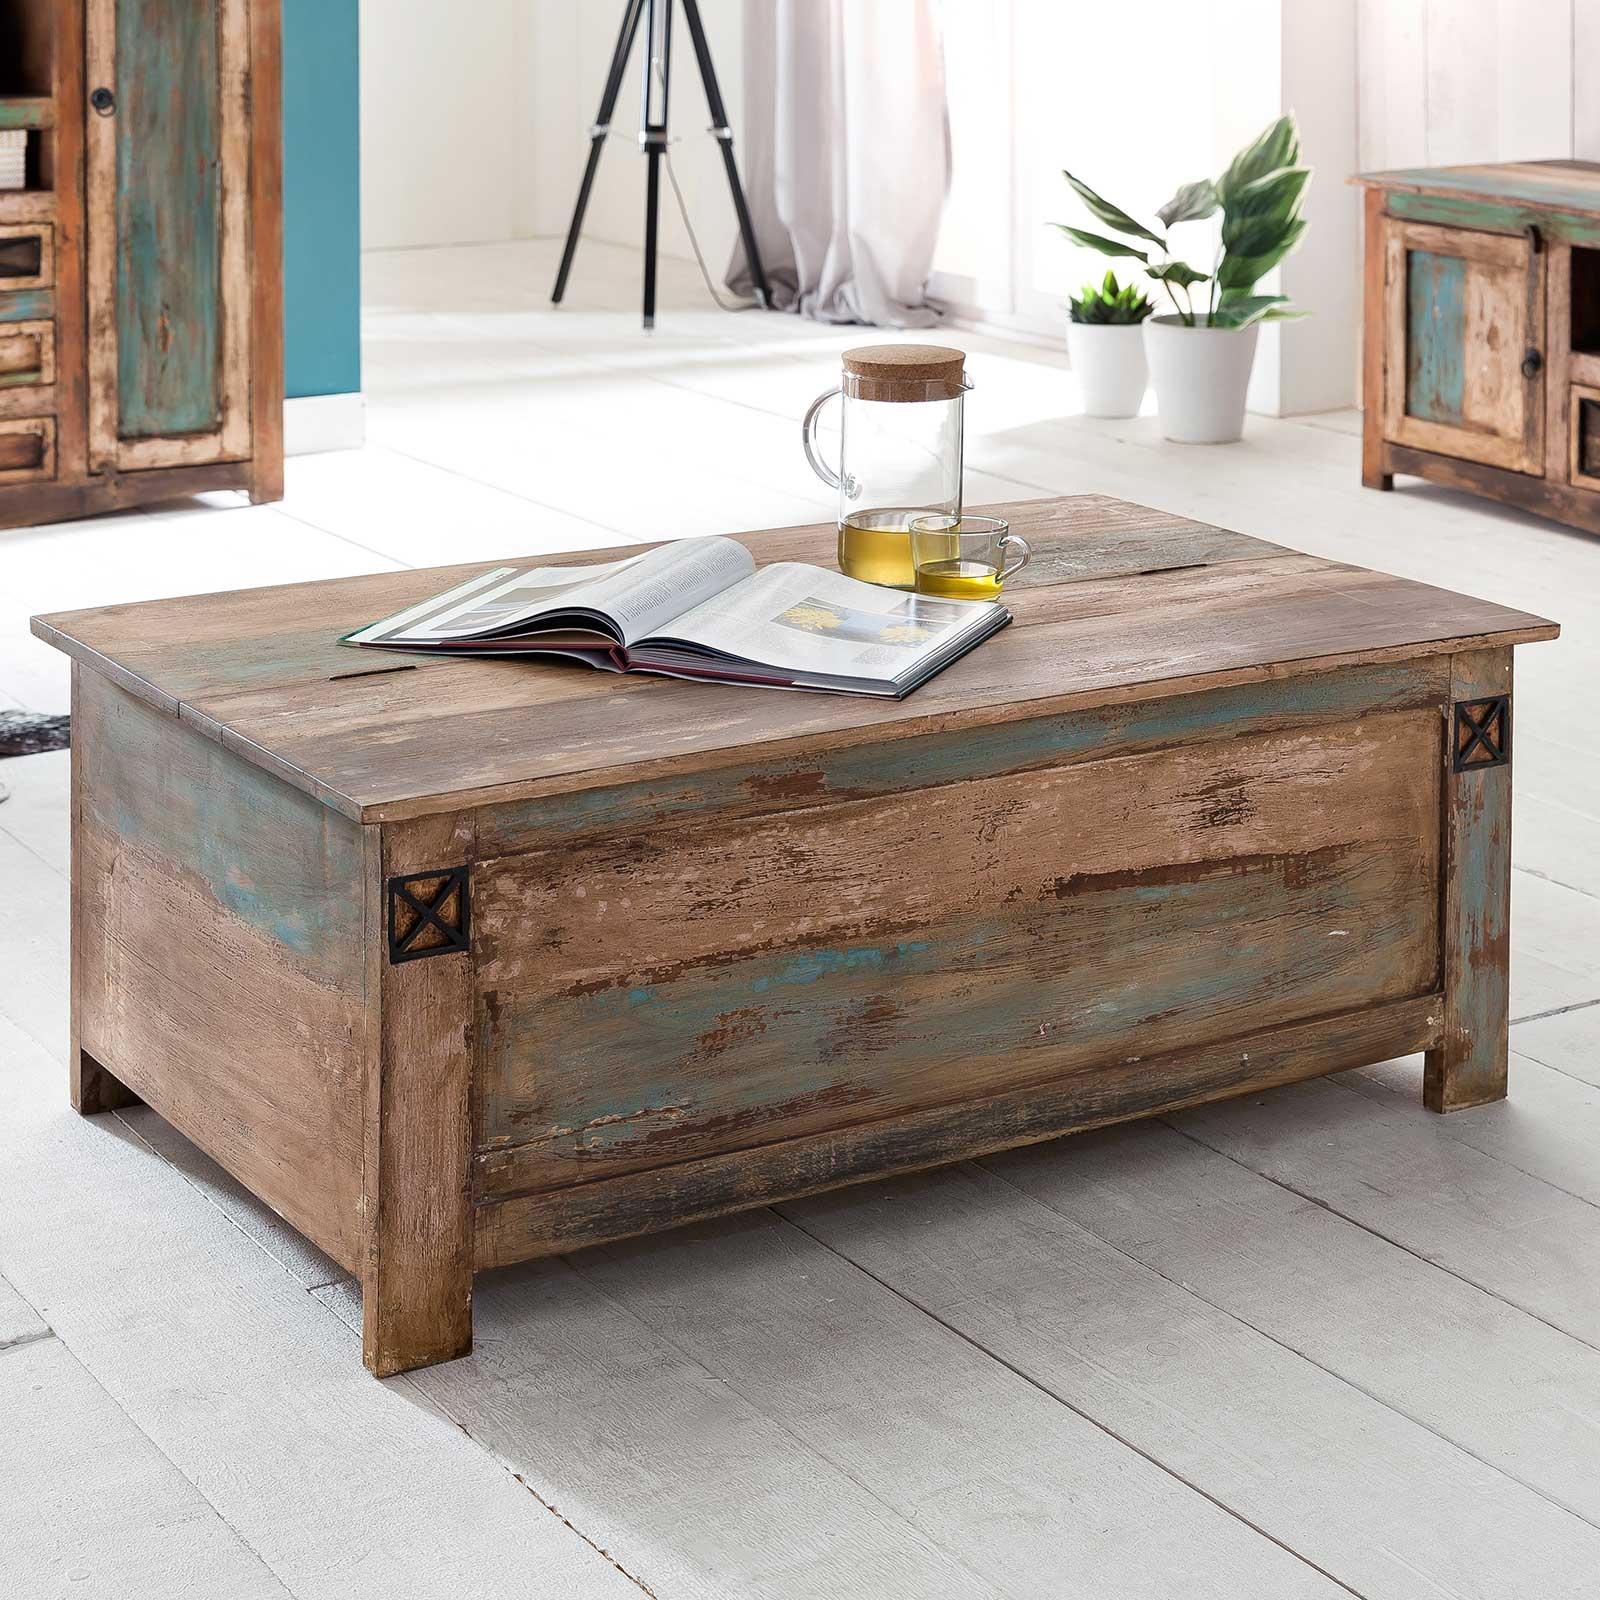 couchtisch largo 115 x 67 cm aus massivholz im vintage look. Black Bedroom Furniture Sets. Home Design Ideas